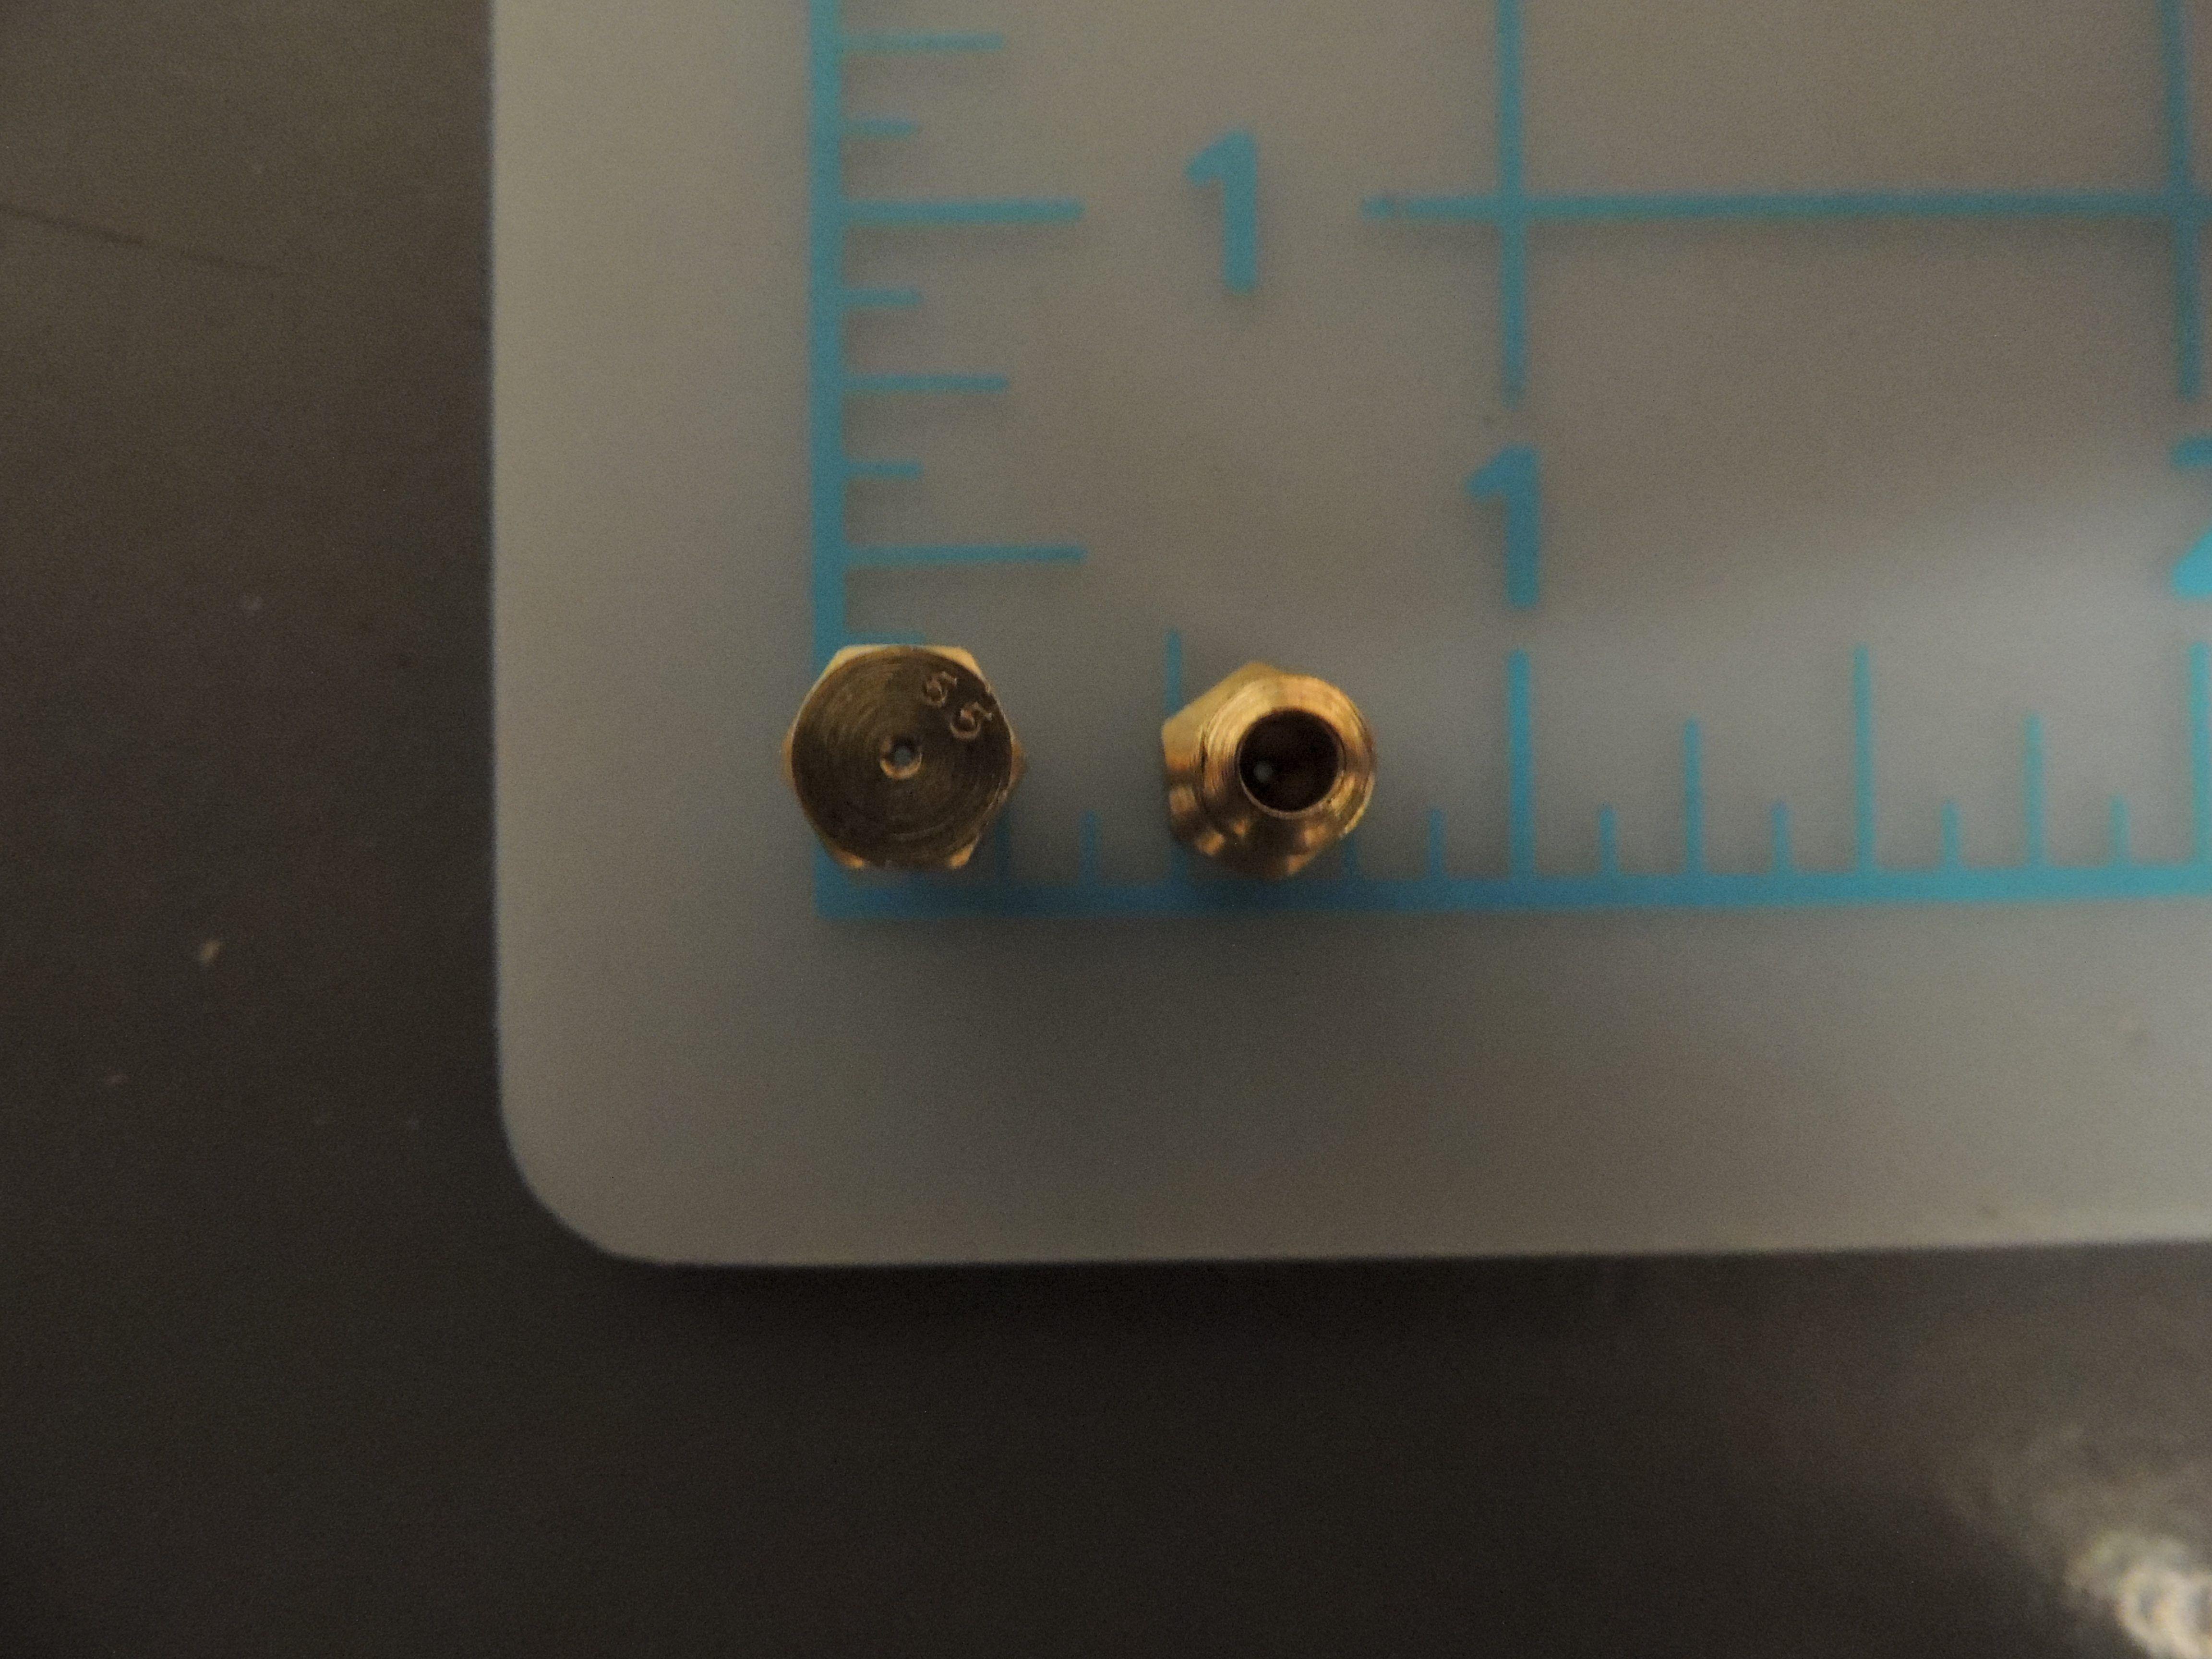 DGR SEMI-RAPID ORIFICE 0.65mm